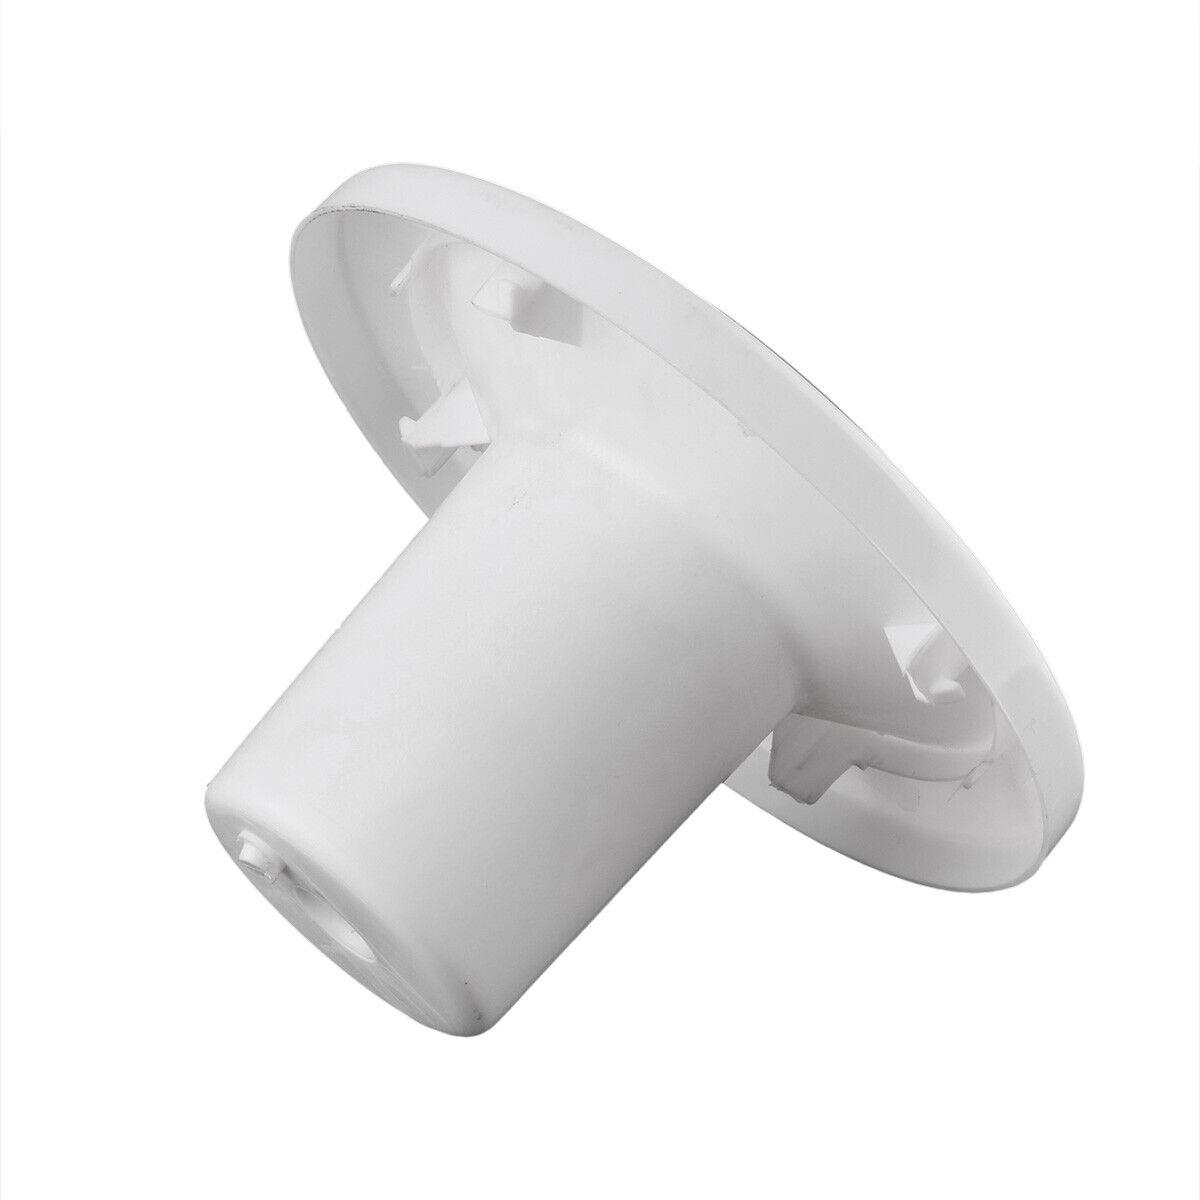 Water Cooler Water Dispenser Bottle Holder Smart Seat Replacement Part Home Lid